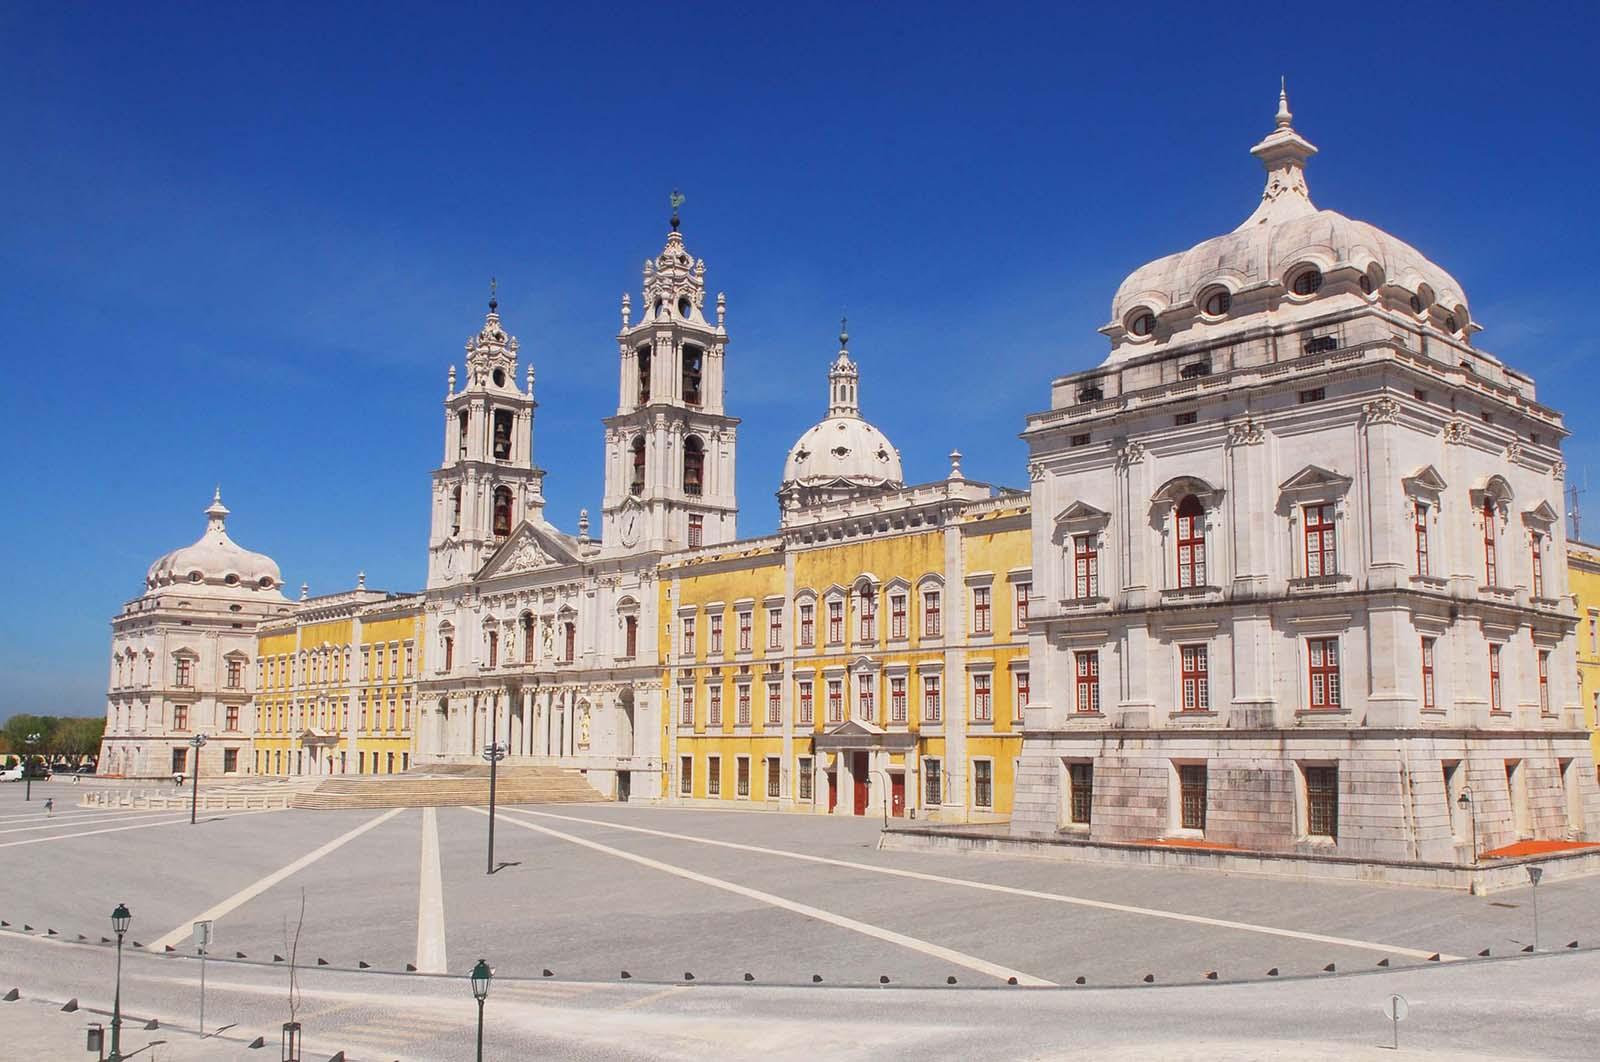 Palácio Convento de Mafra, Portugal